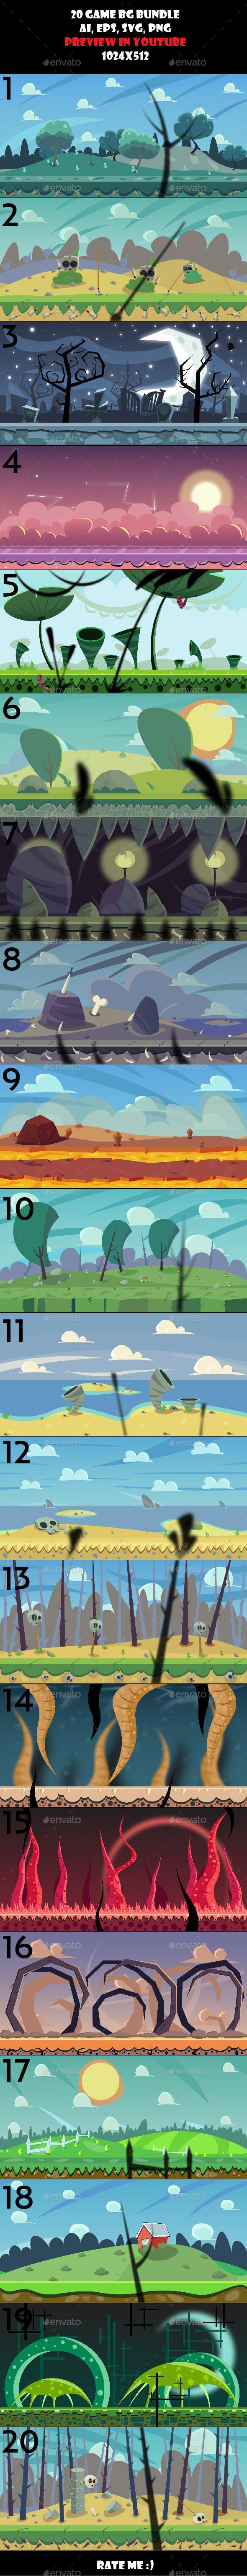 20 BG bundle (Backgrounds)